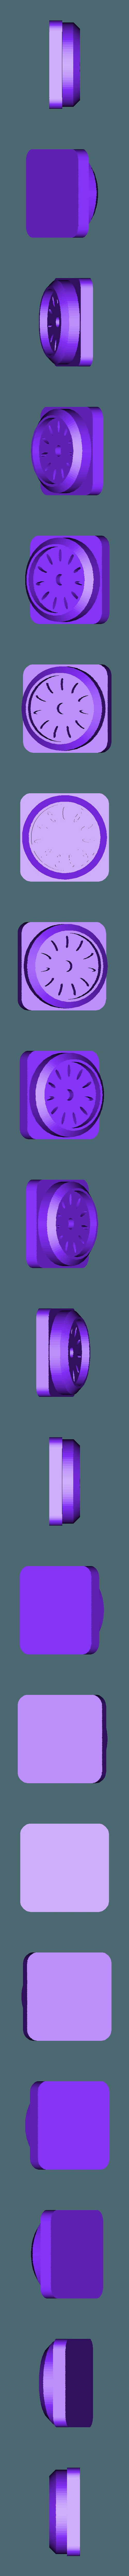 side_buttons_2_x2.stl Download free STL file ORCA communicator (Godzilla) • 3D printing object, poblocki1982